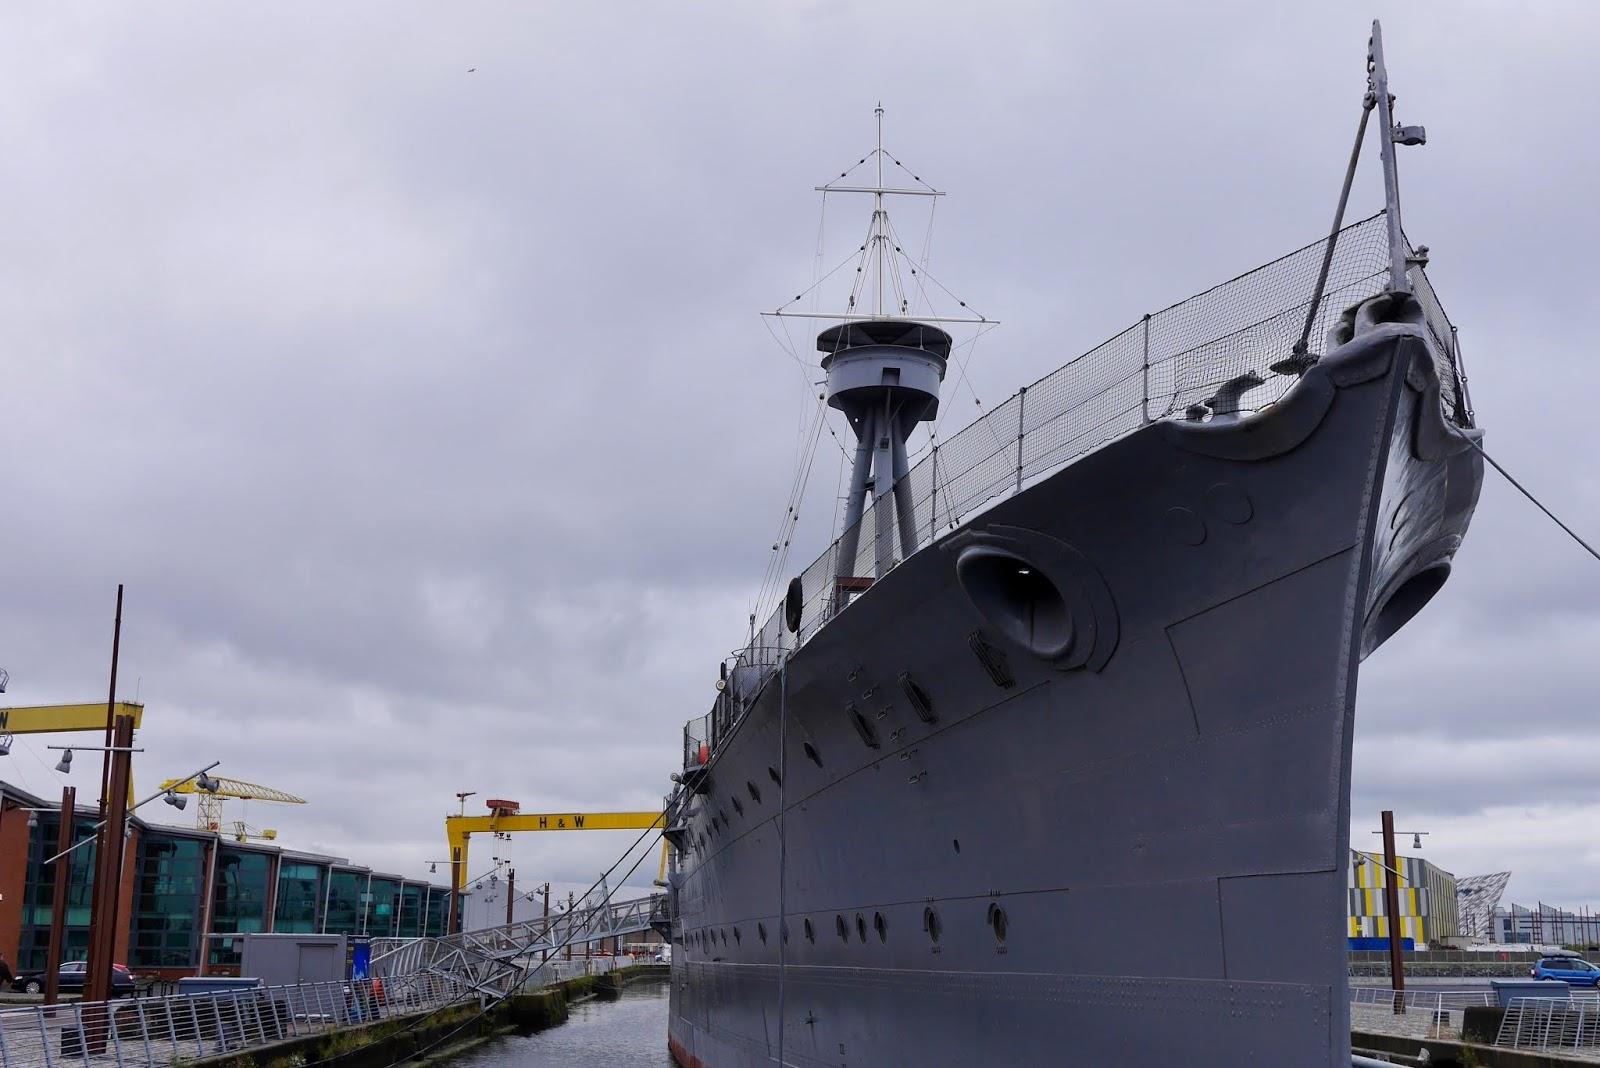 World War 1 light cruiser HMS Caroline in Belfast by  Scottish Blogger Cal McTravels from www.calmctravels.com